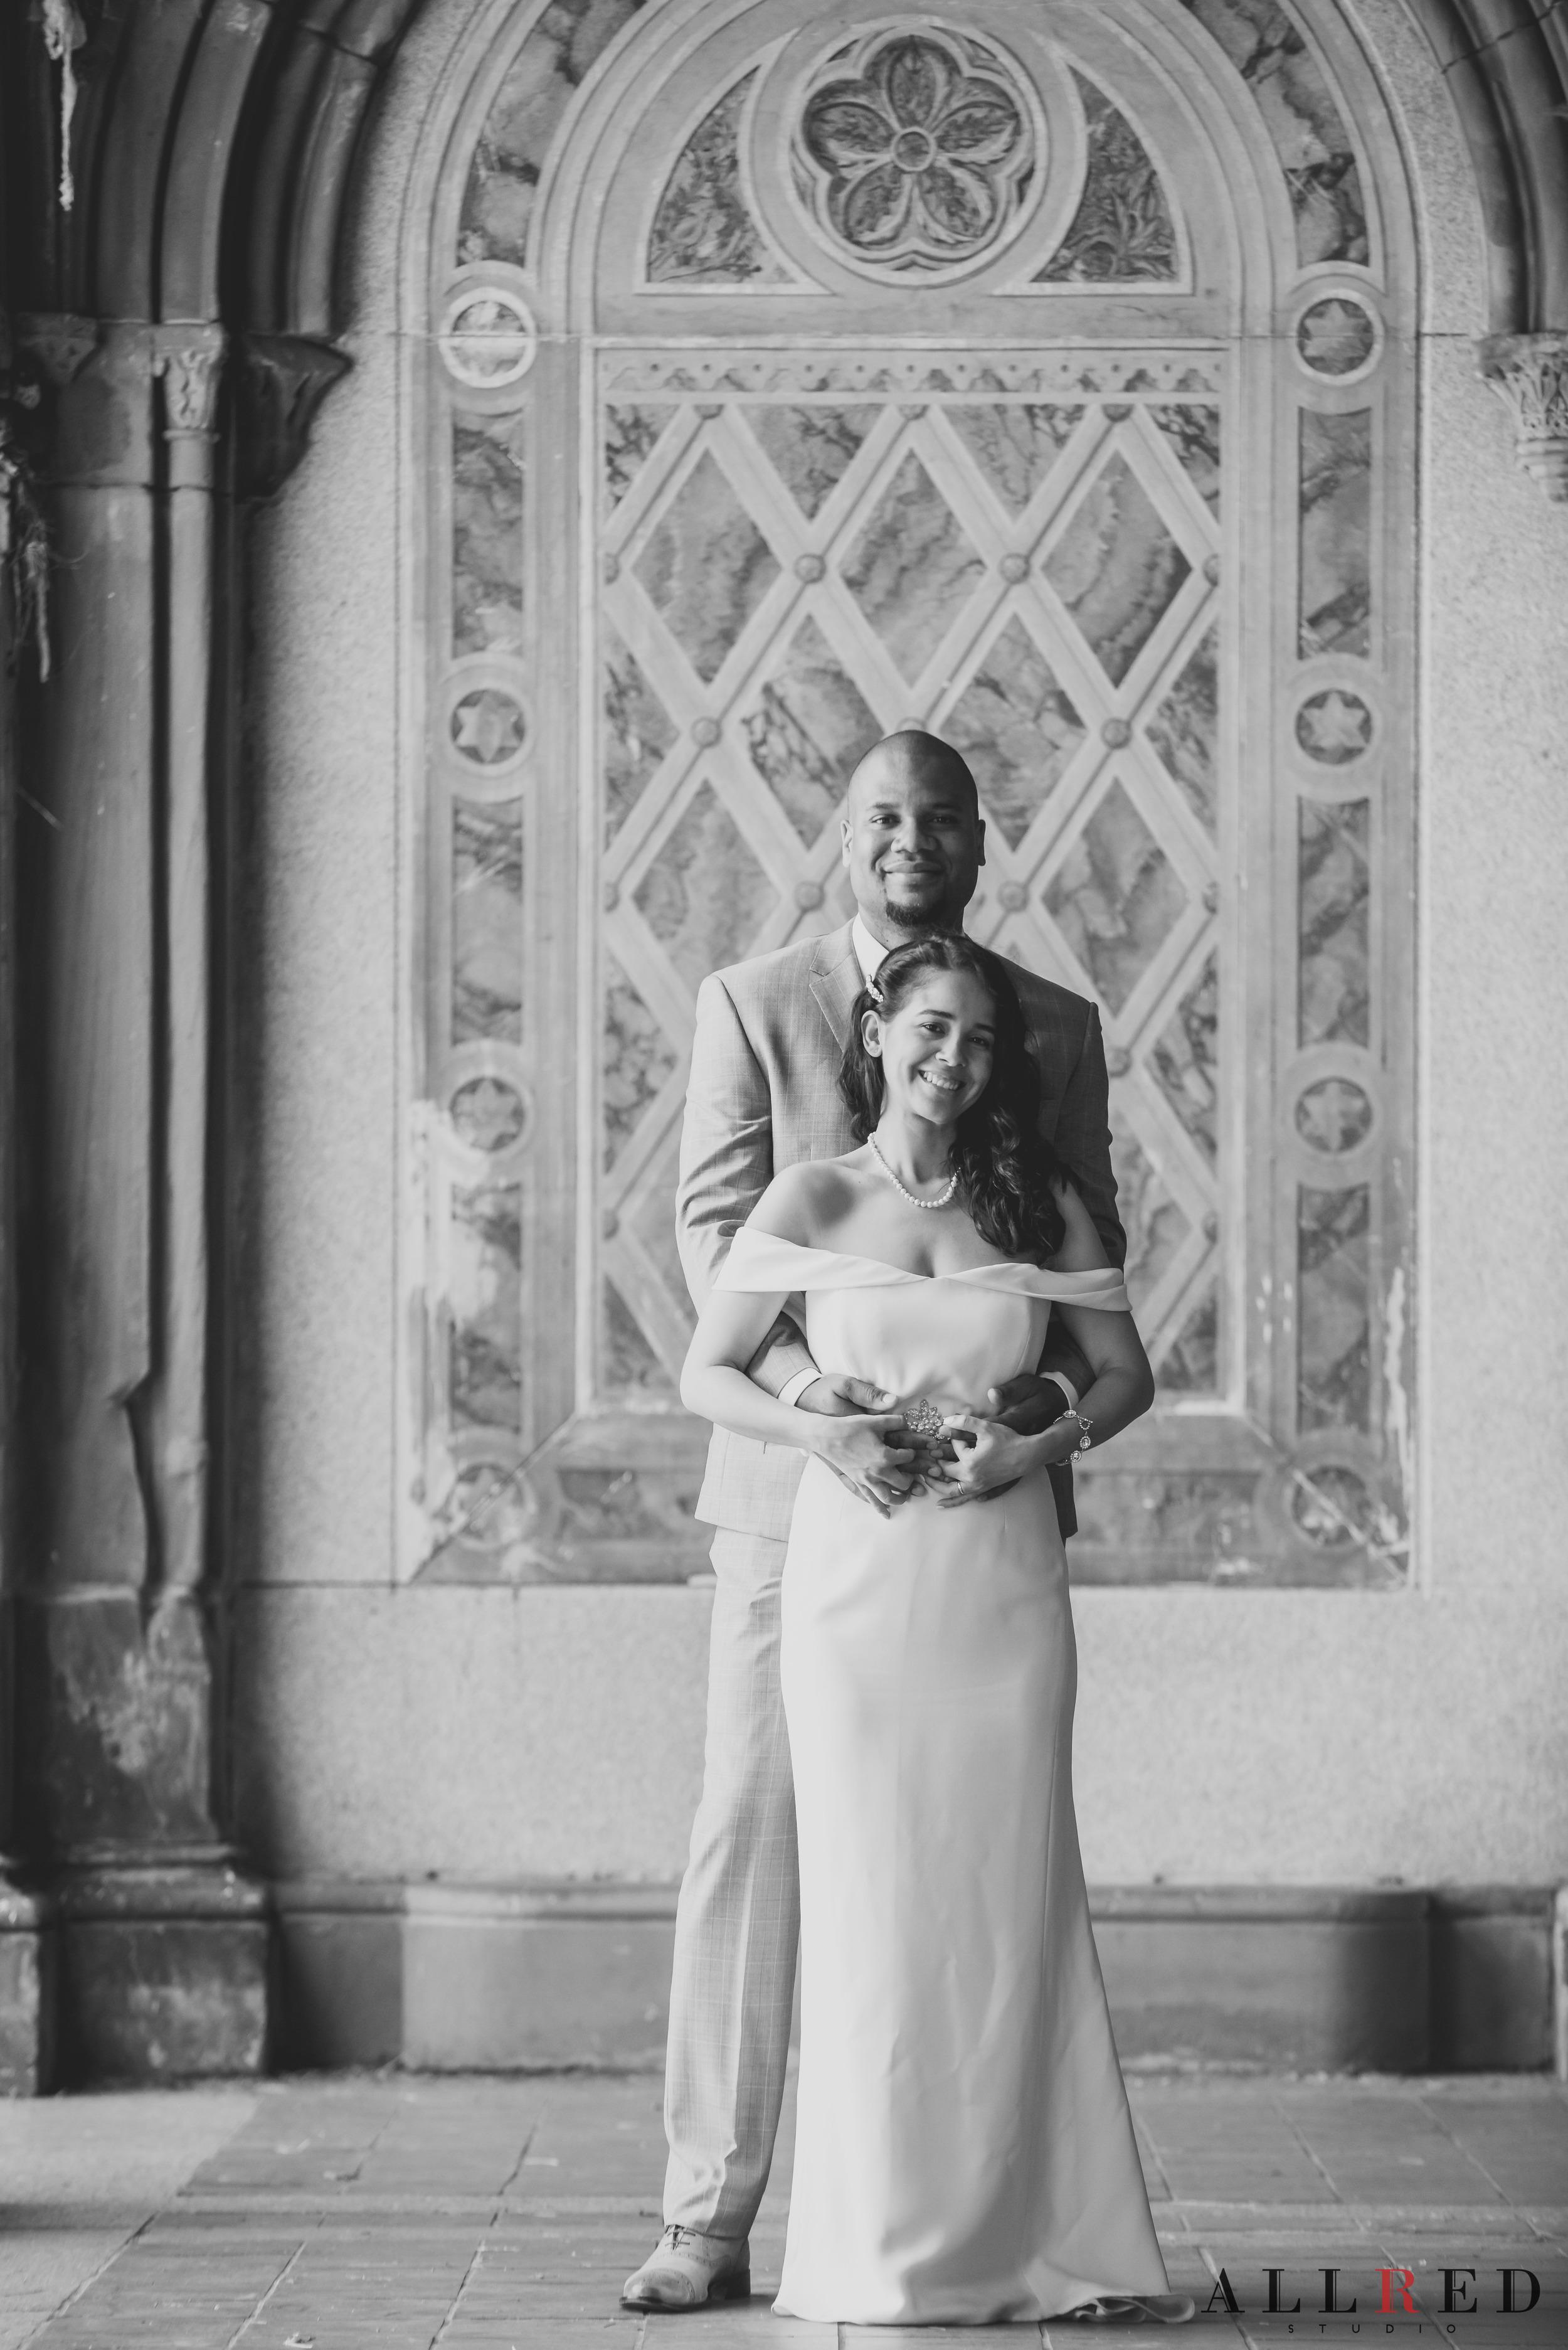 Wedding-central-park-allred-studio-new-york-photographer-new-jersey-hudson-valley-2613.jpg